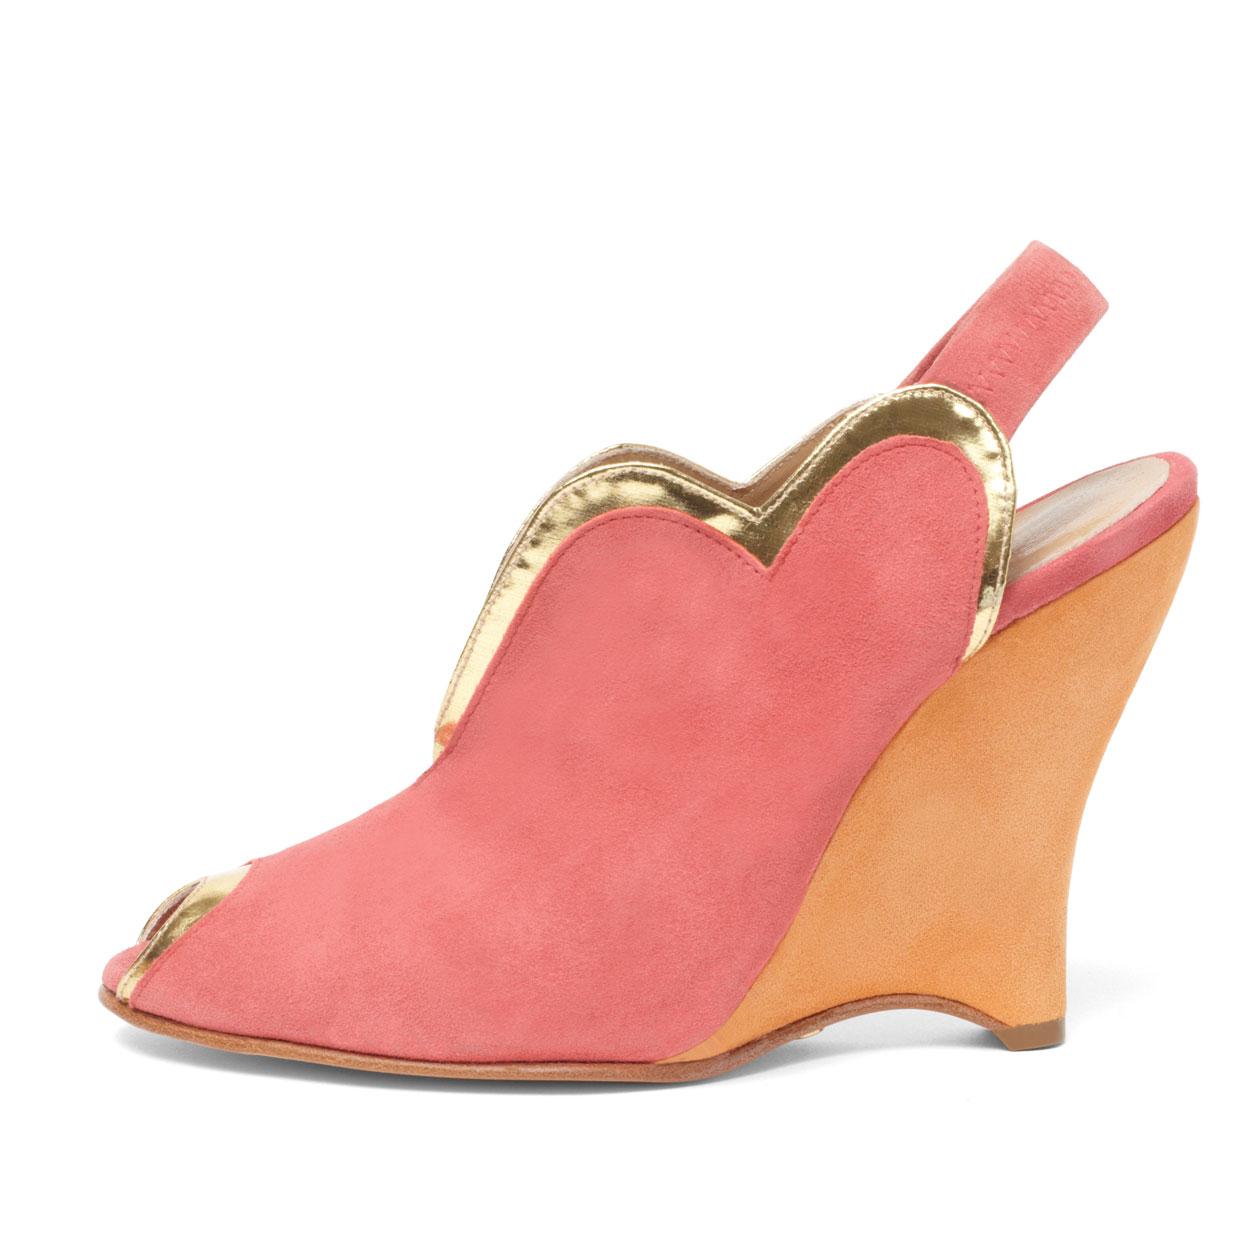 bubble-pink-side-shoes-heels-fashion-luxury-cleob-shop-shopping.jpg